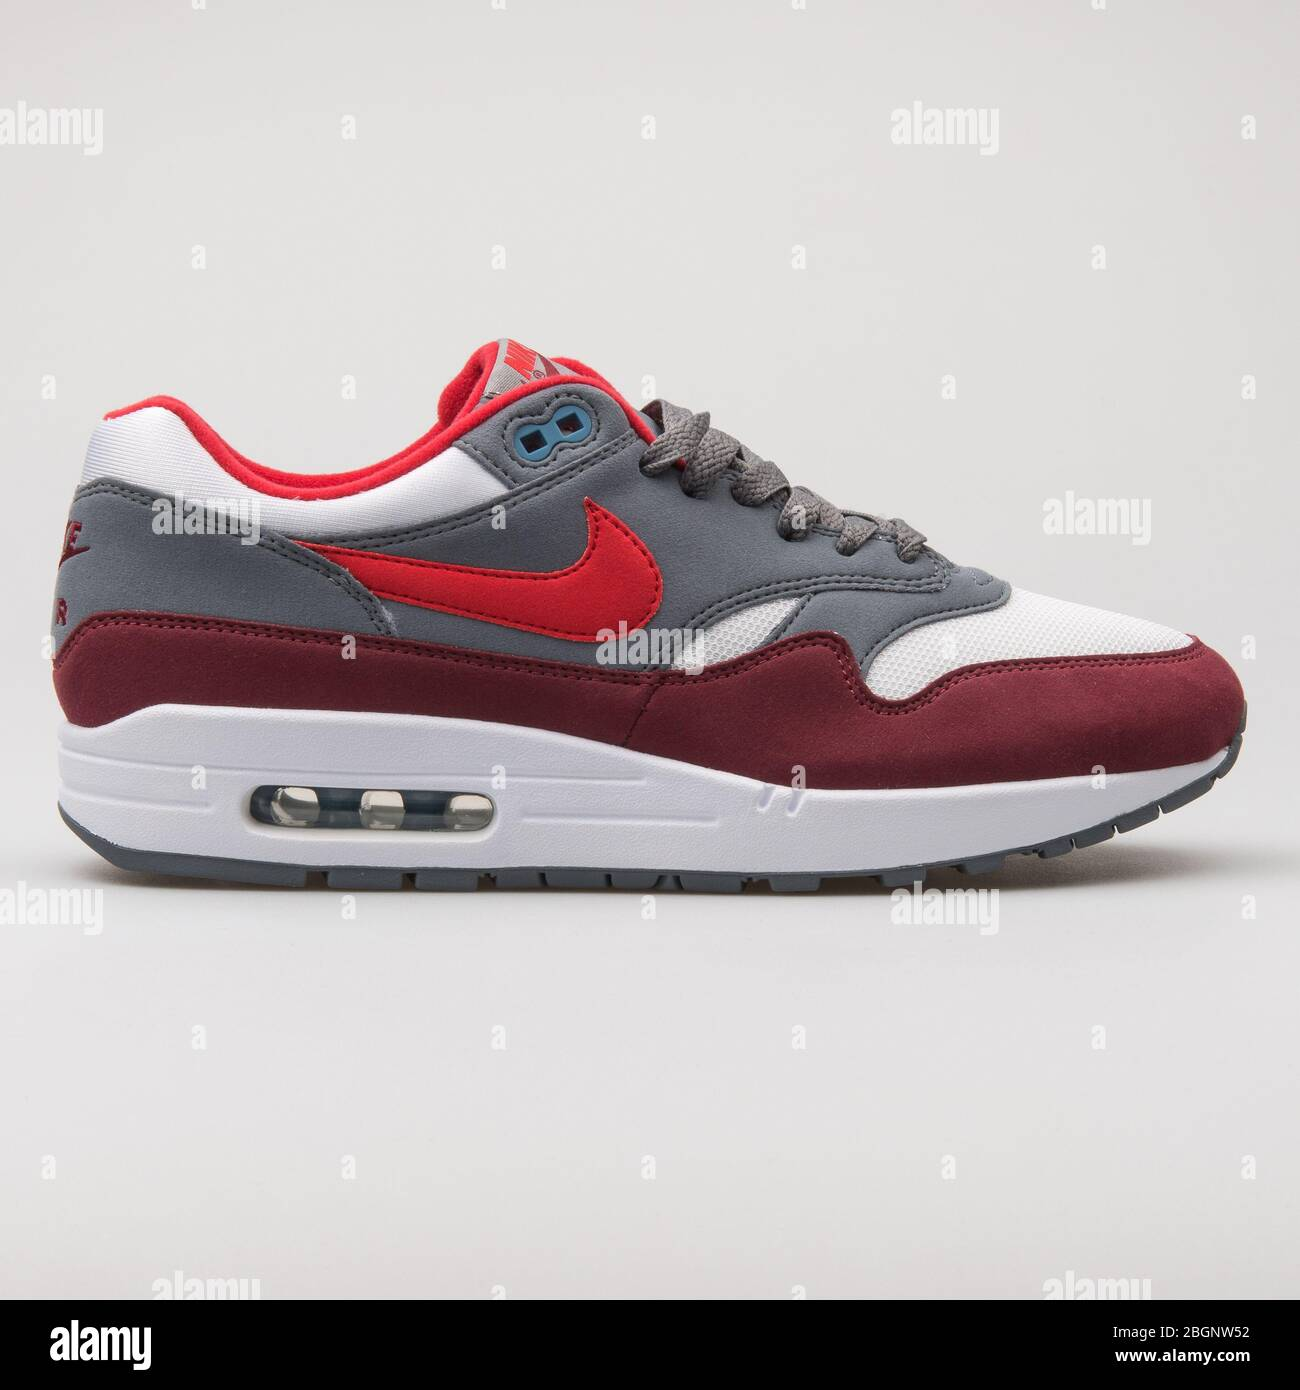 Nike Air Max 1 Premium white, grey, red